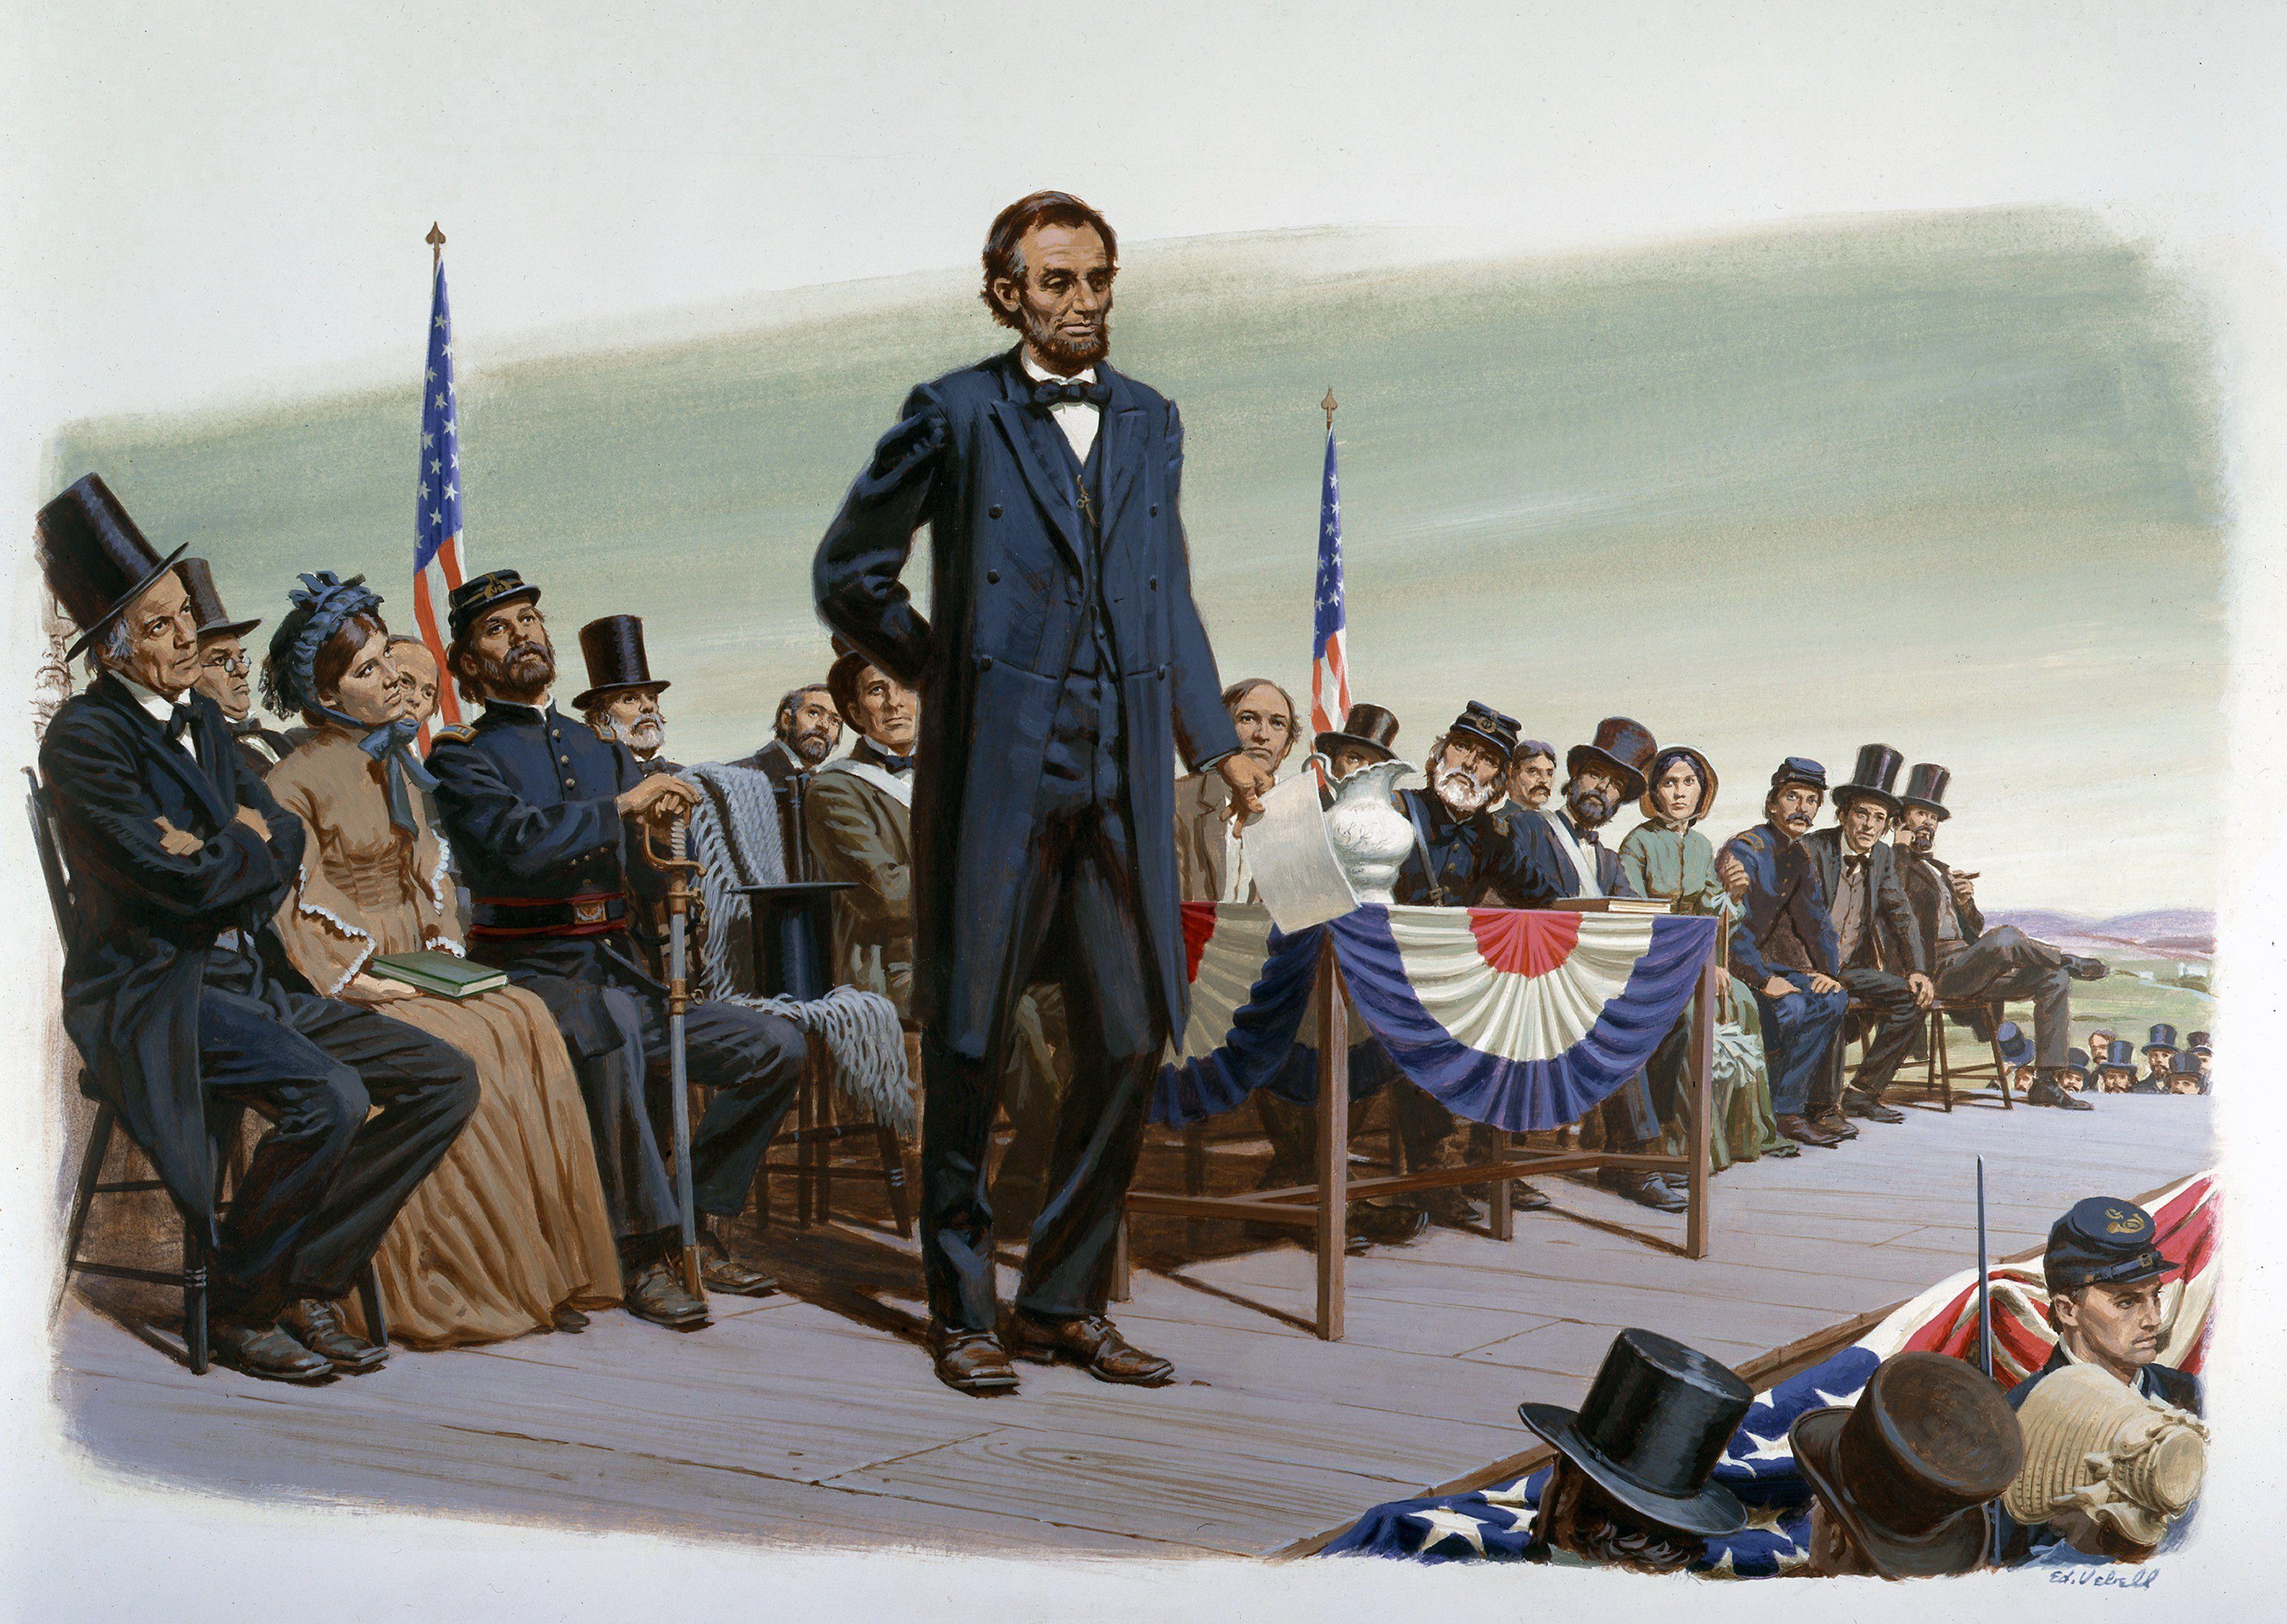 president lincolns speech - HD3802×2700